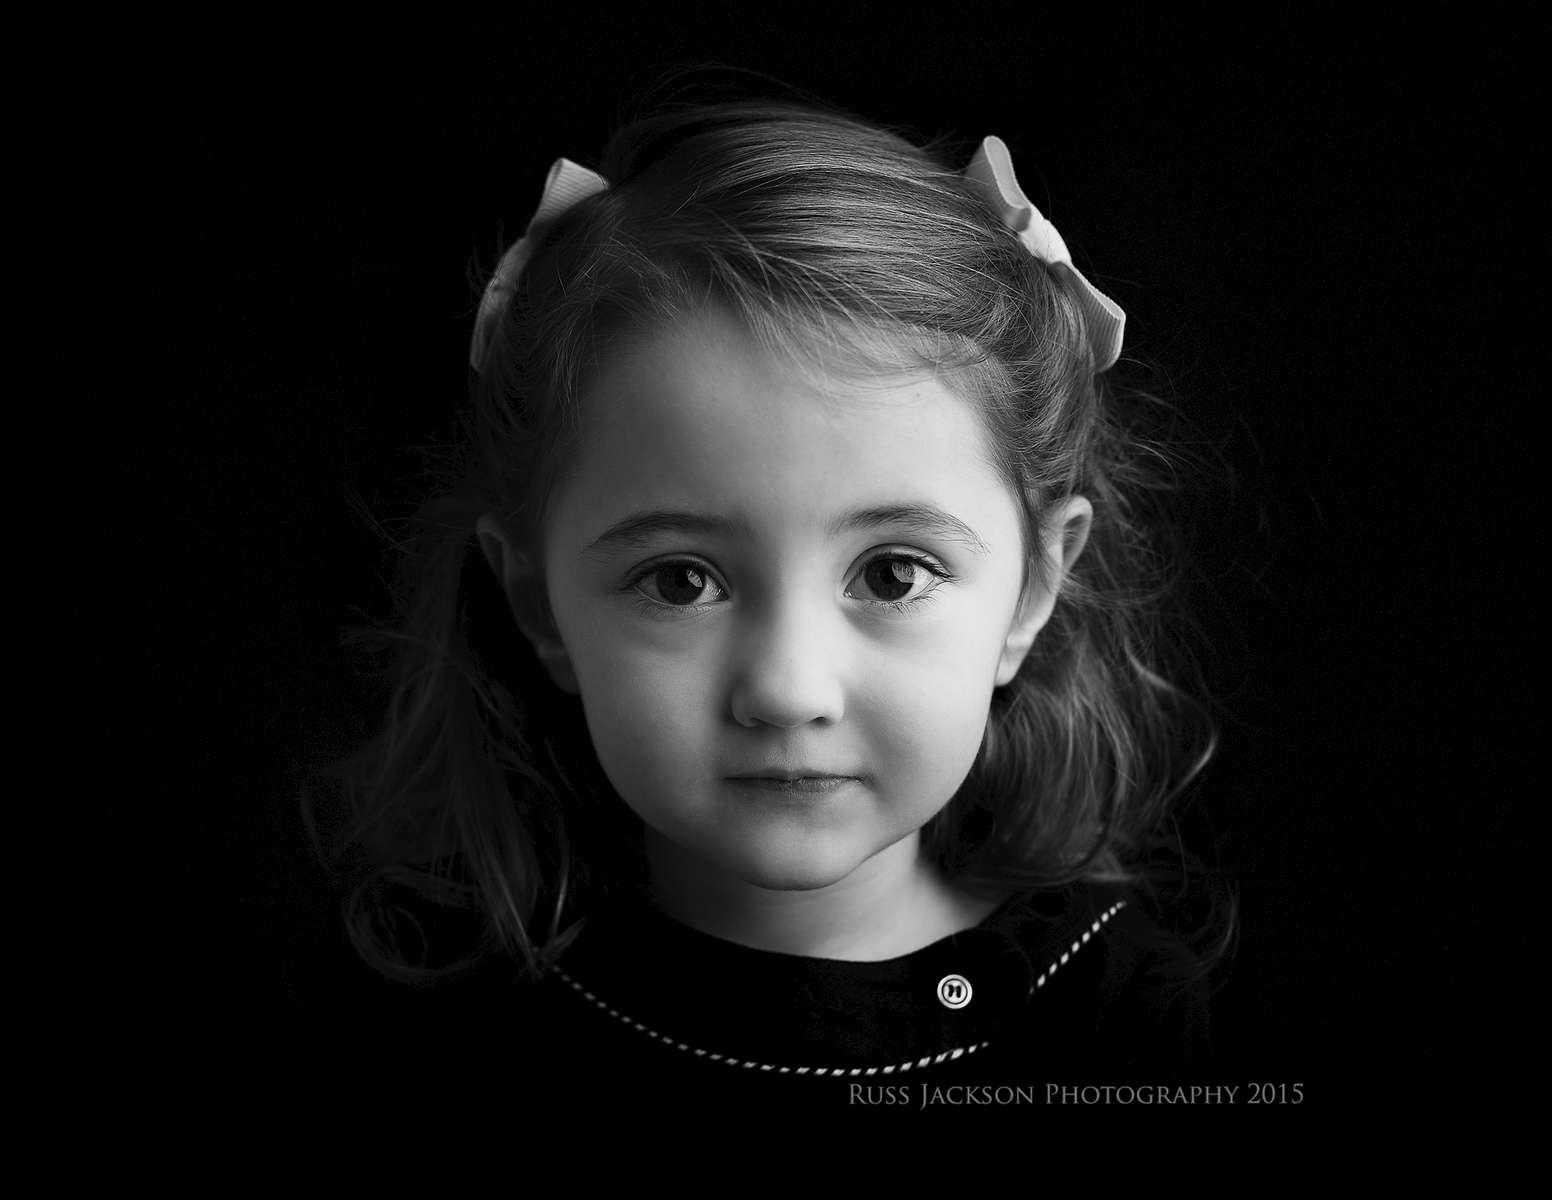 digital photo professional 5d mark ii 10